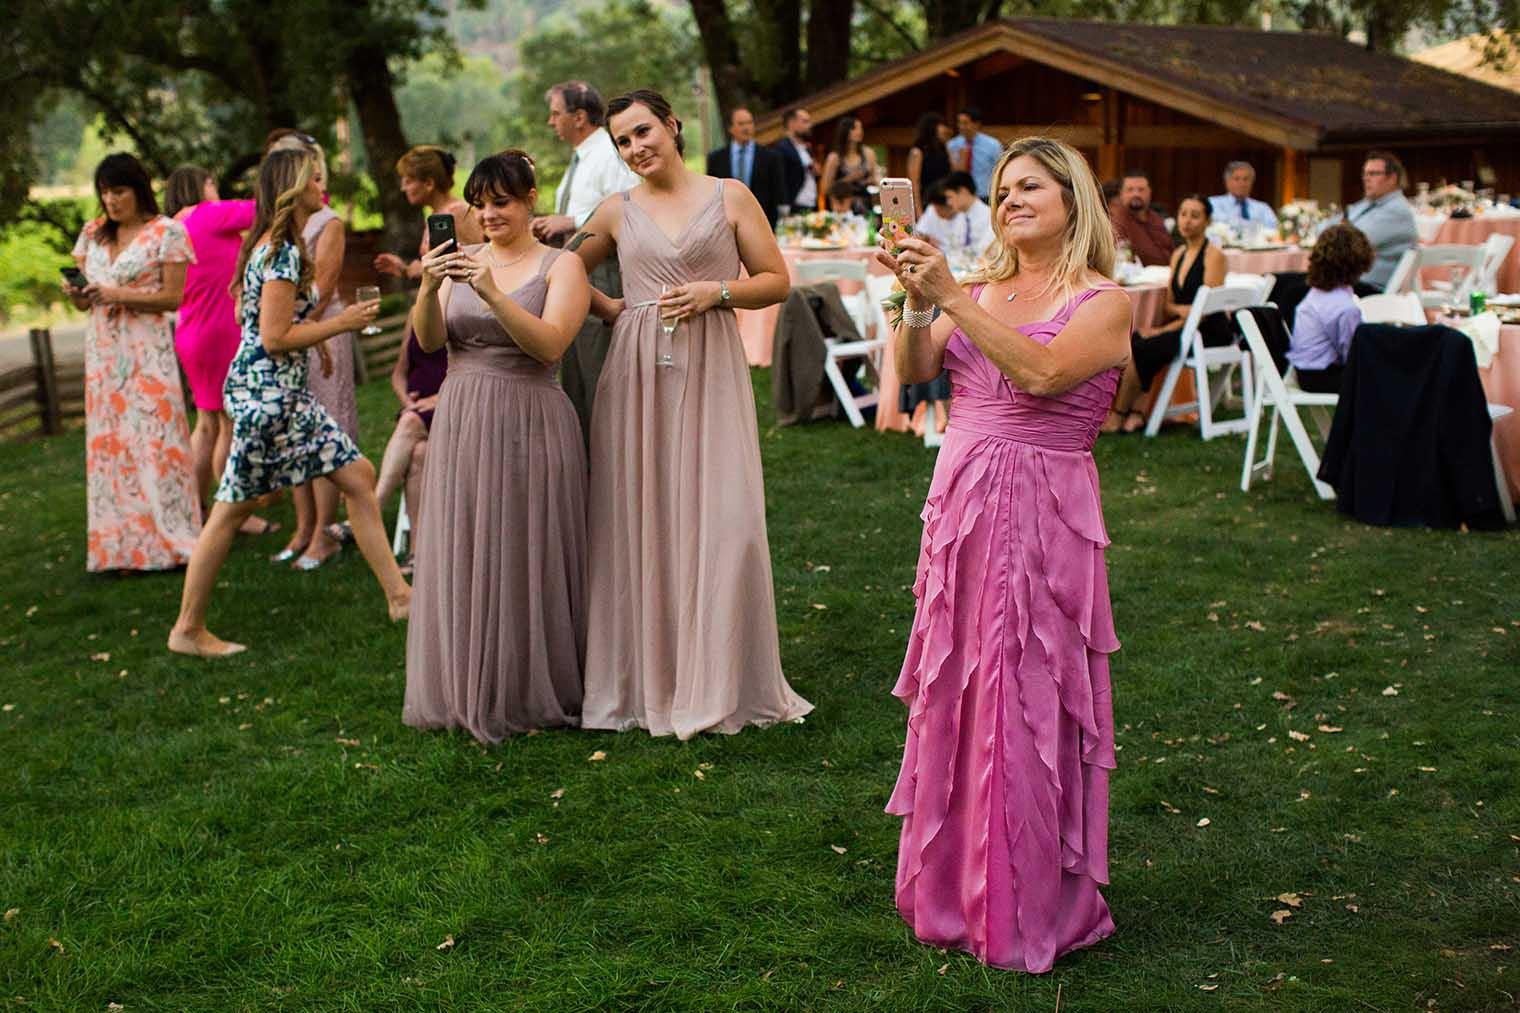 Nelson Family Vineyards Wedding Reception